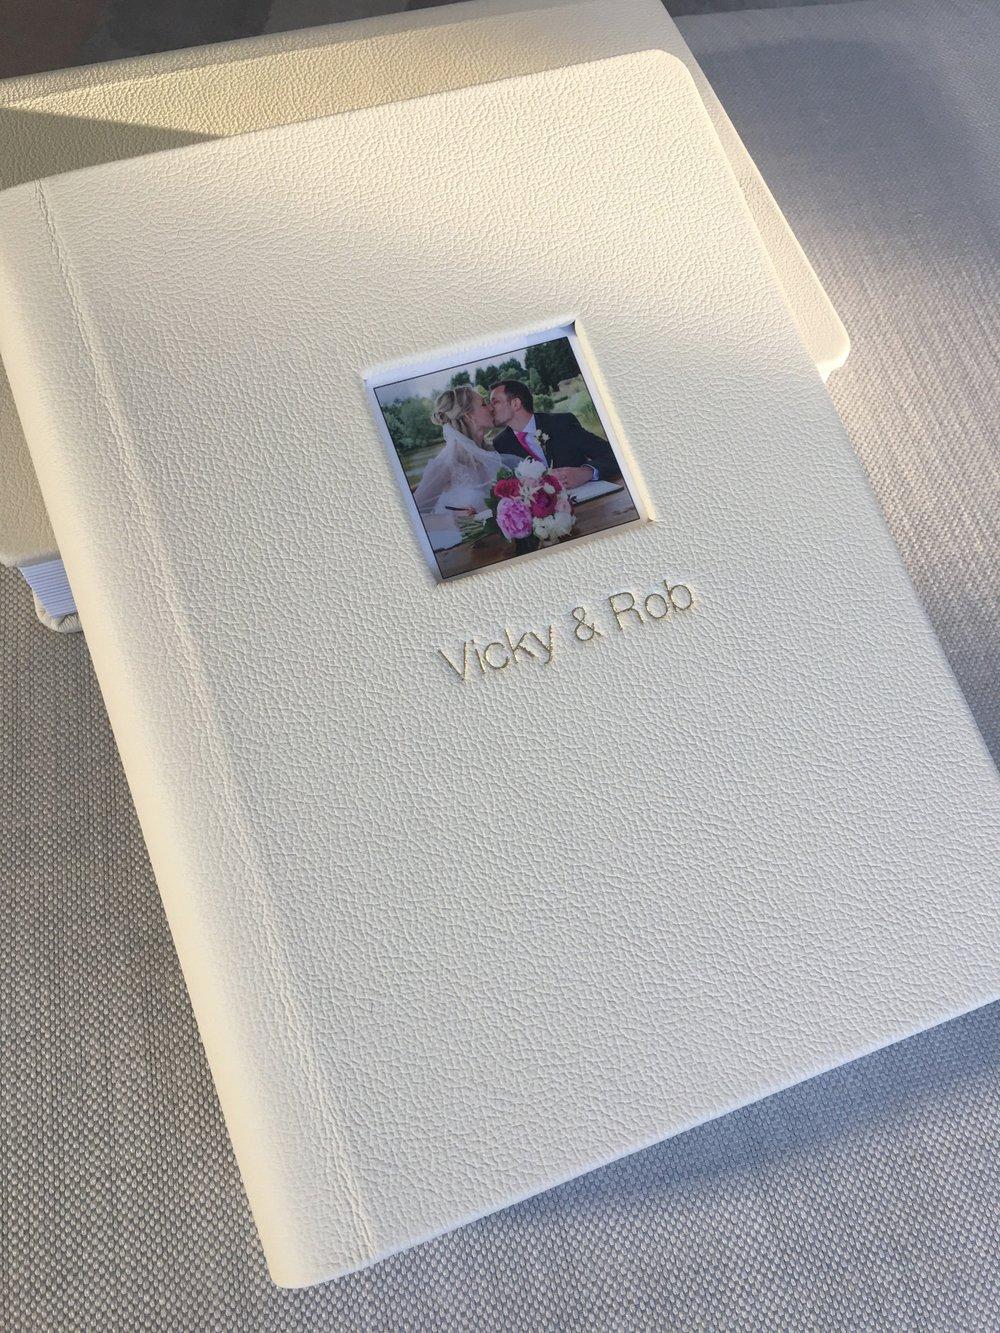 Graphistudio Original Wedding Album Rigid pages, Gold lux lining, picture window 1.jpg